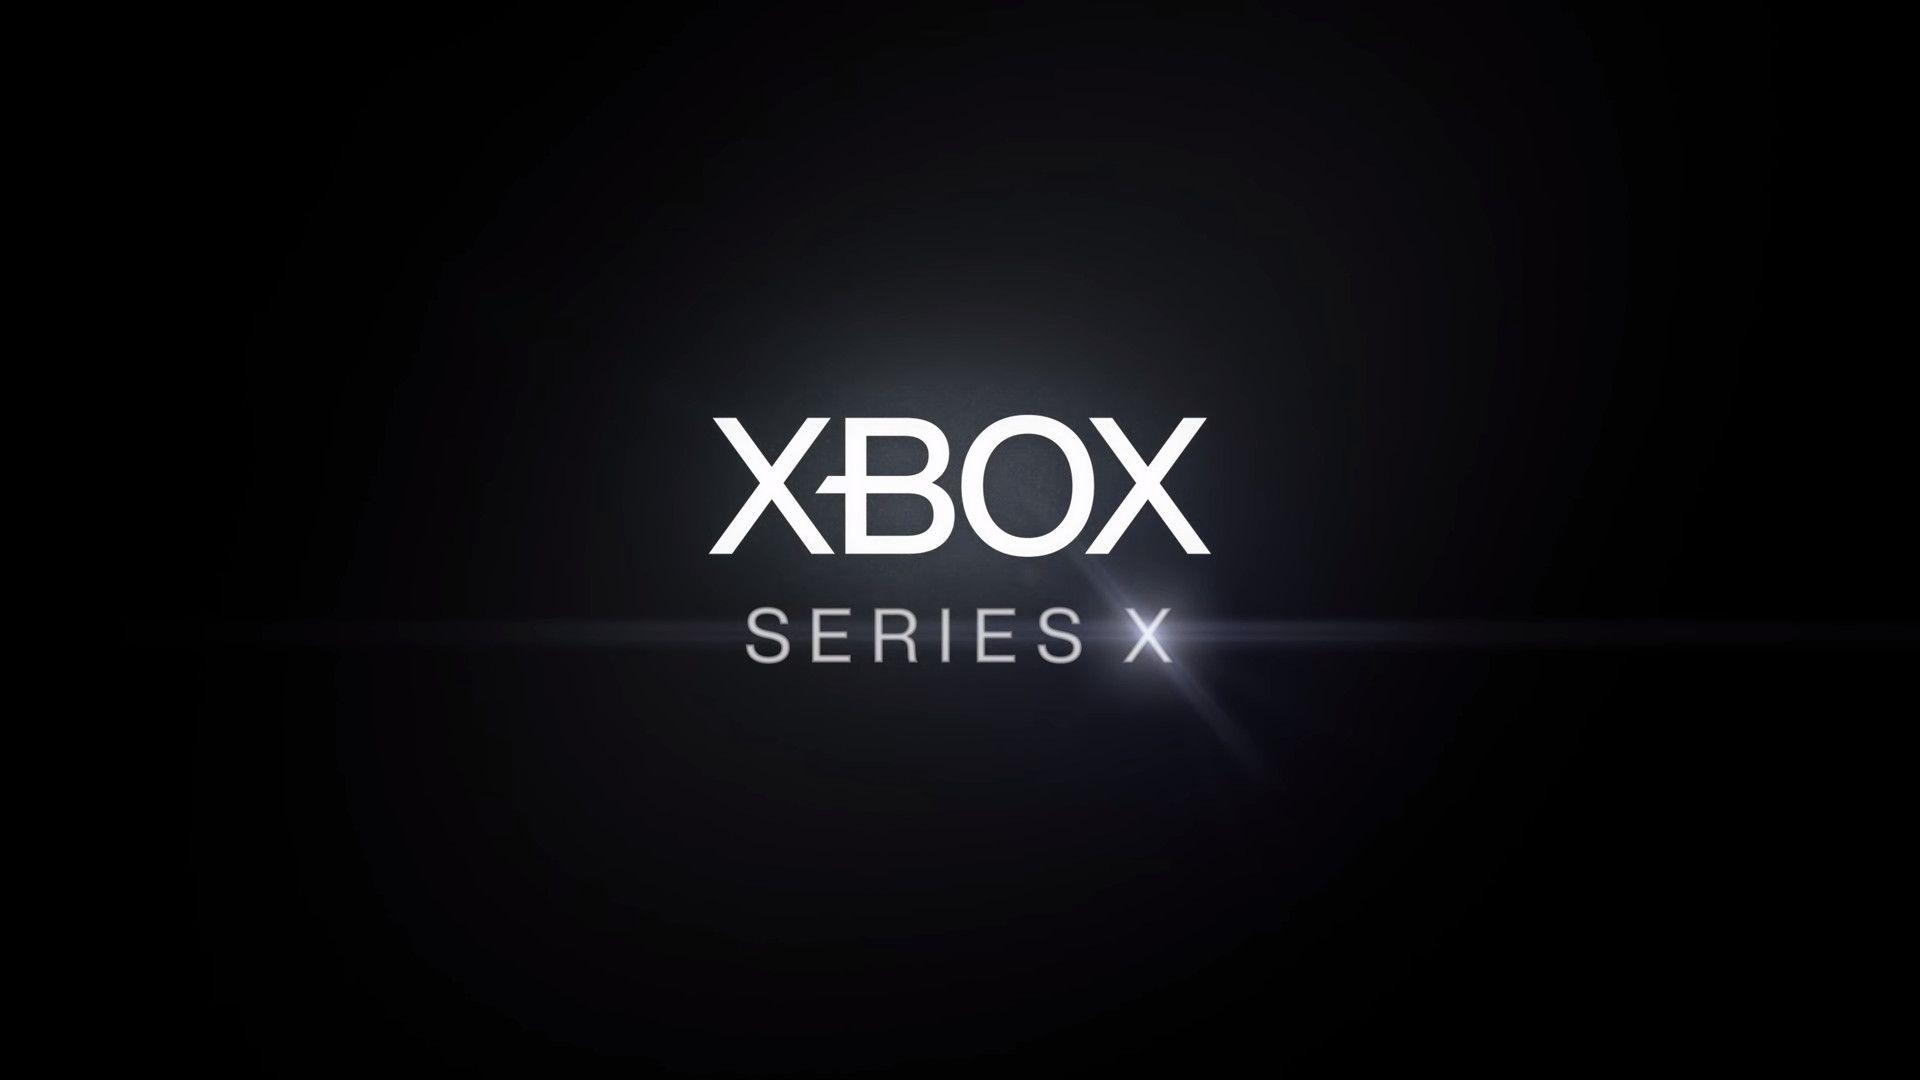 Xbox Series PC Wallpaper